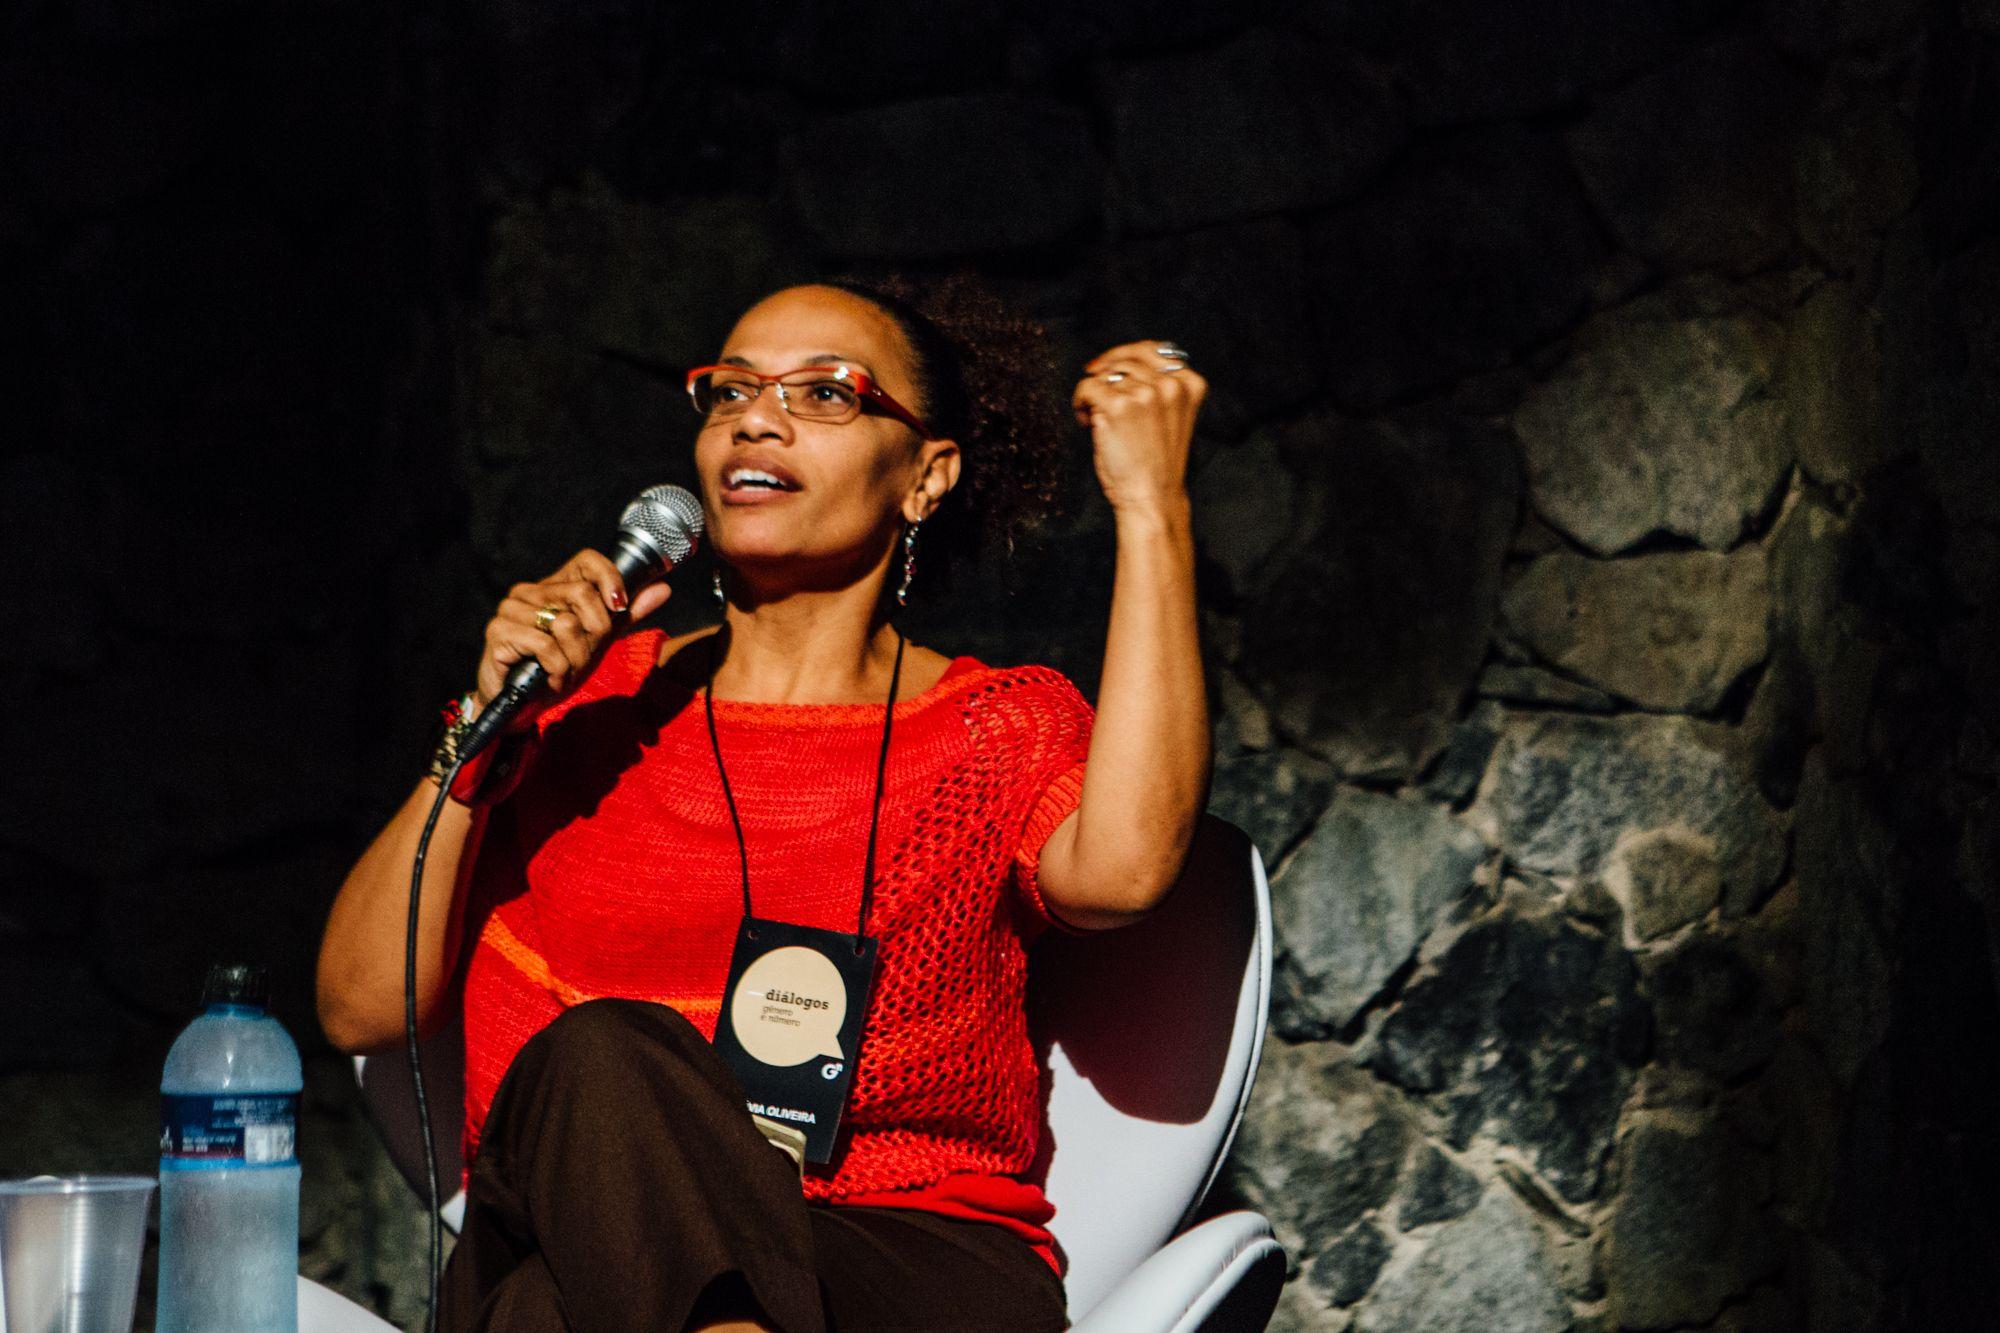 A jornalista Flávia Oliveira discute equidade e interseccionalidade na primeira mesa do dia. Foto: Juliana Chalita